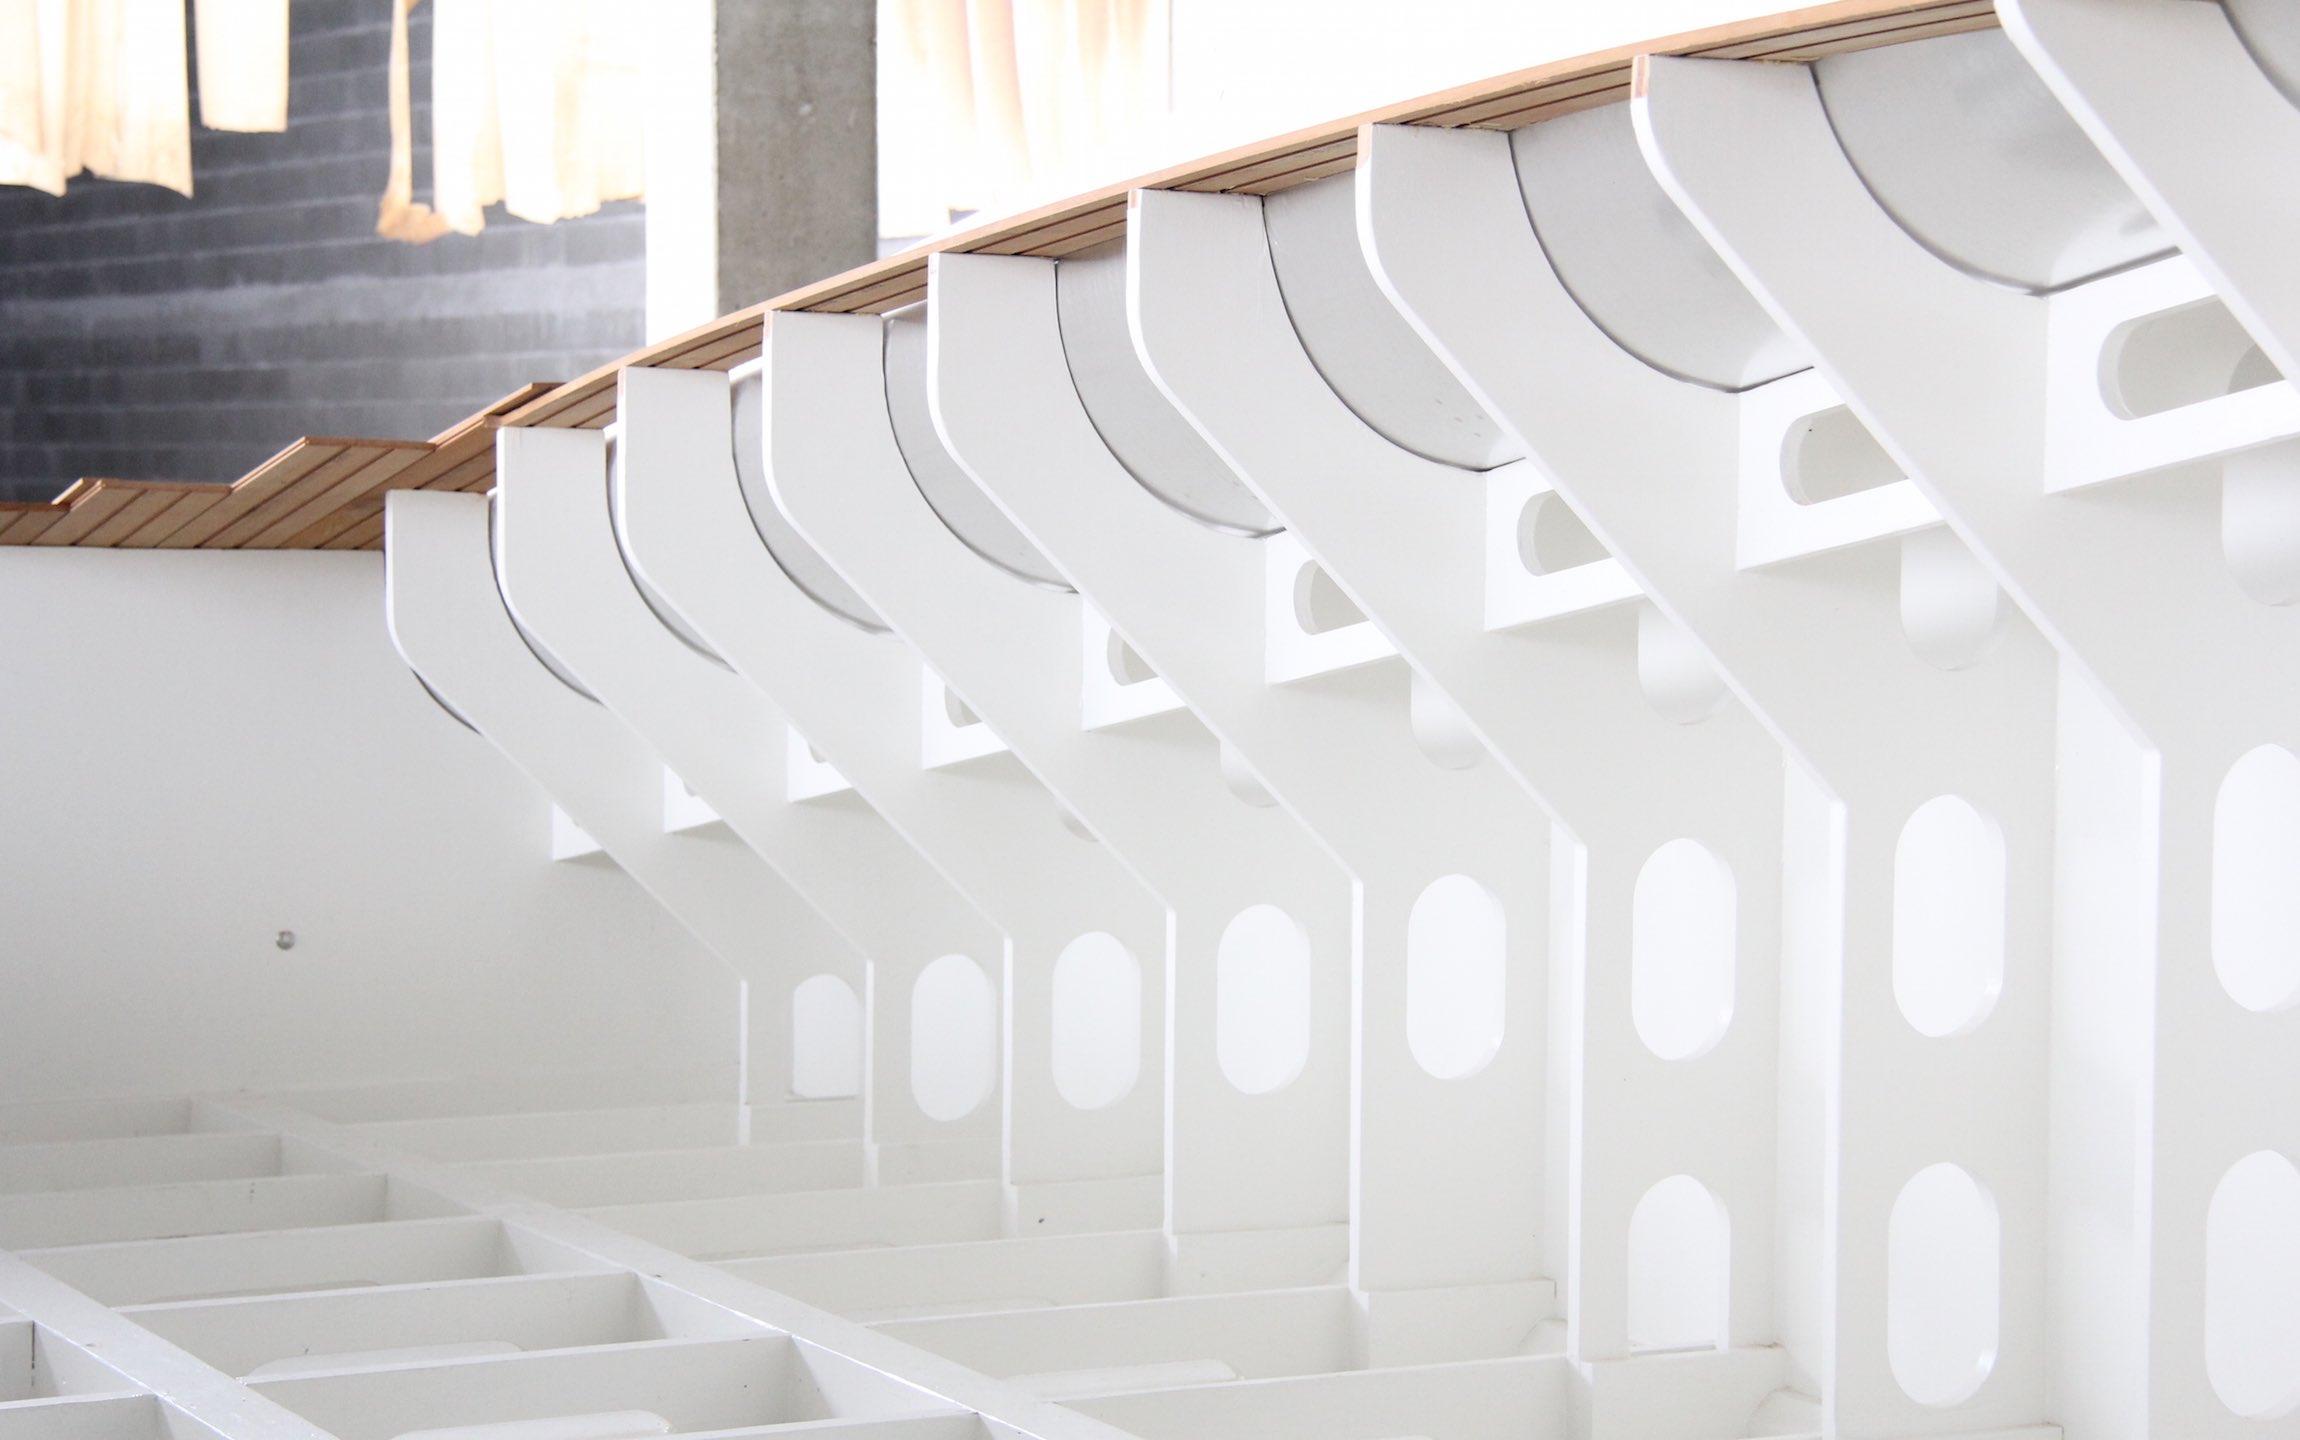 Bootsdesign luftkissenboot projekt leadership for Design nachbau